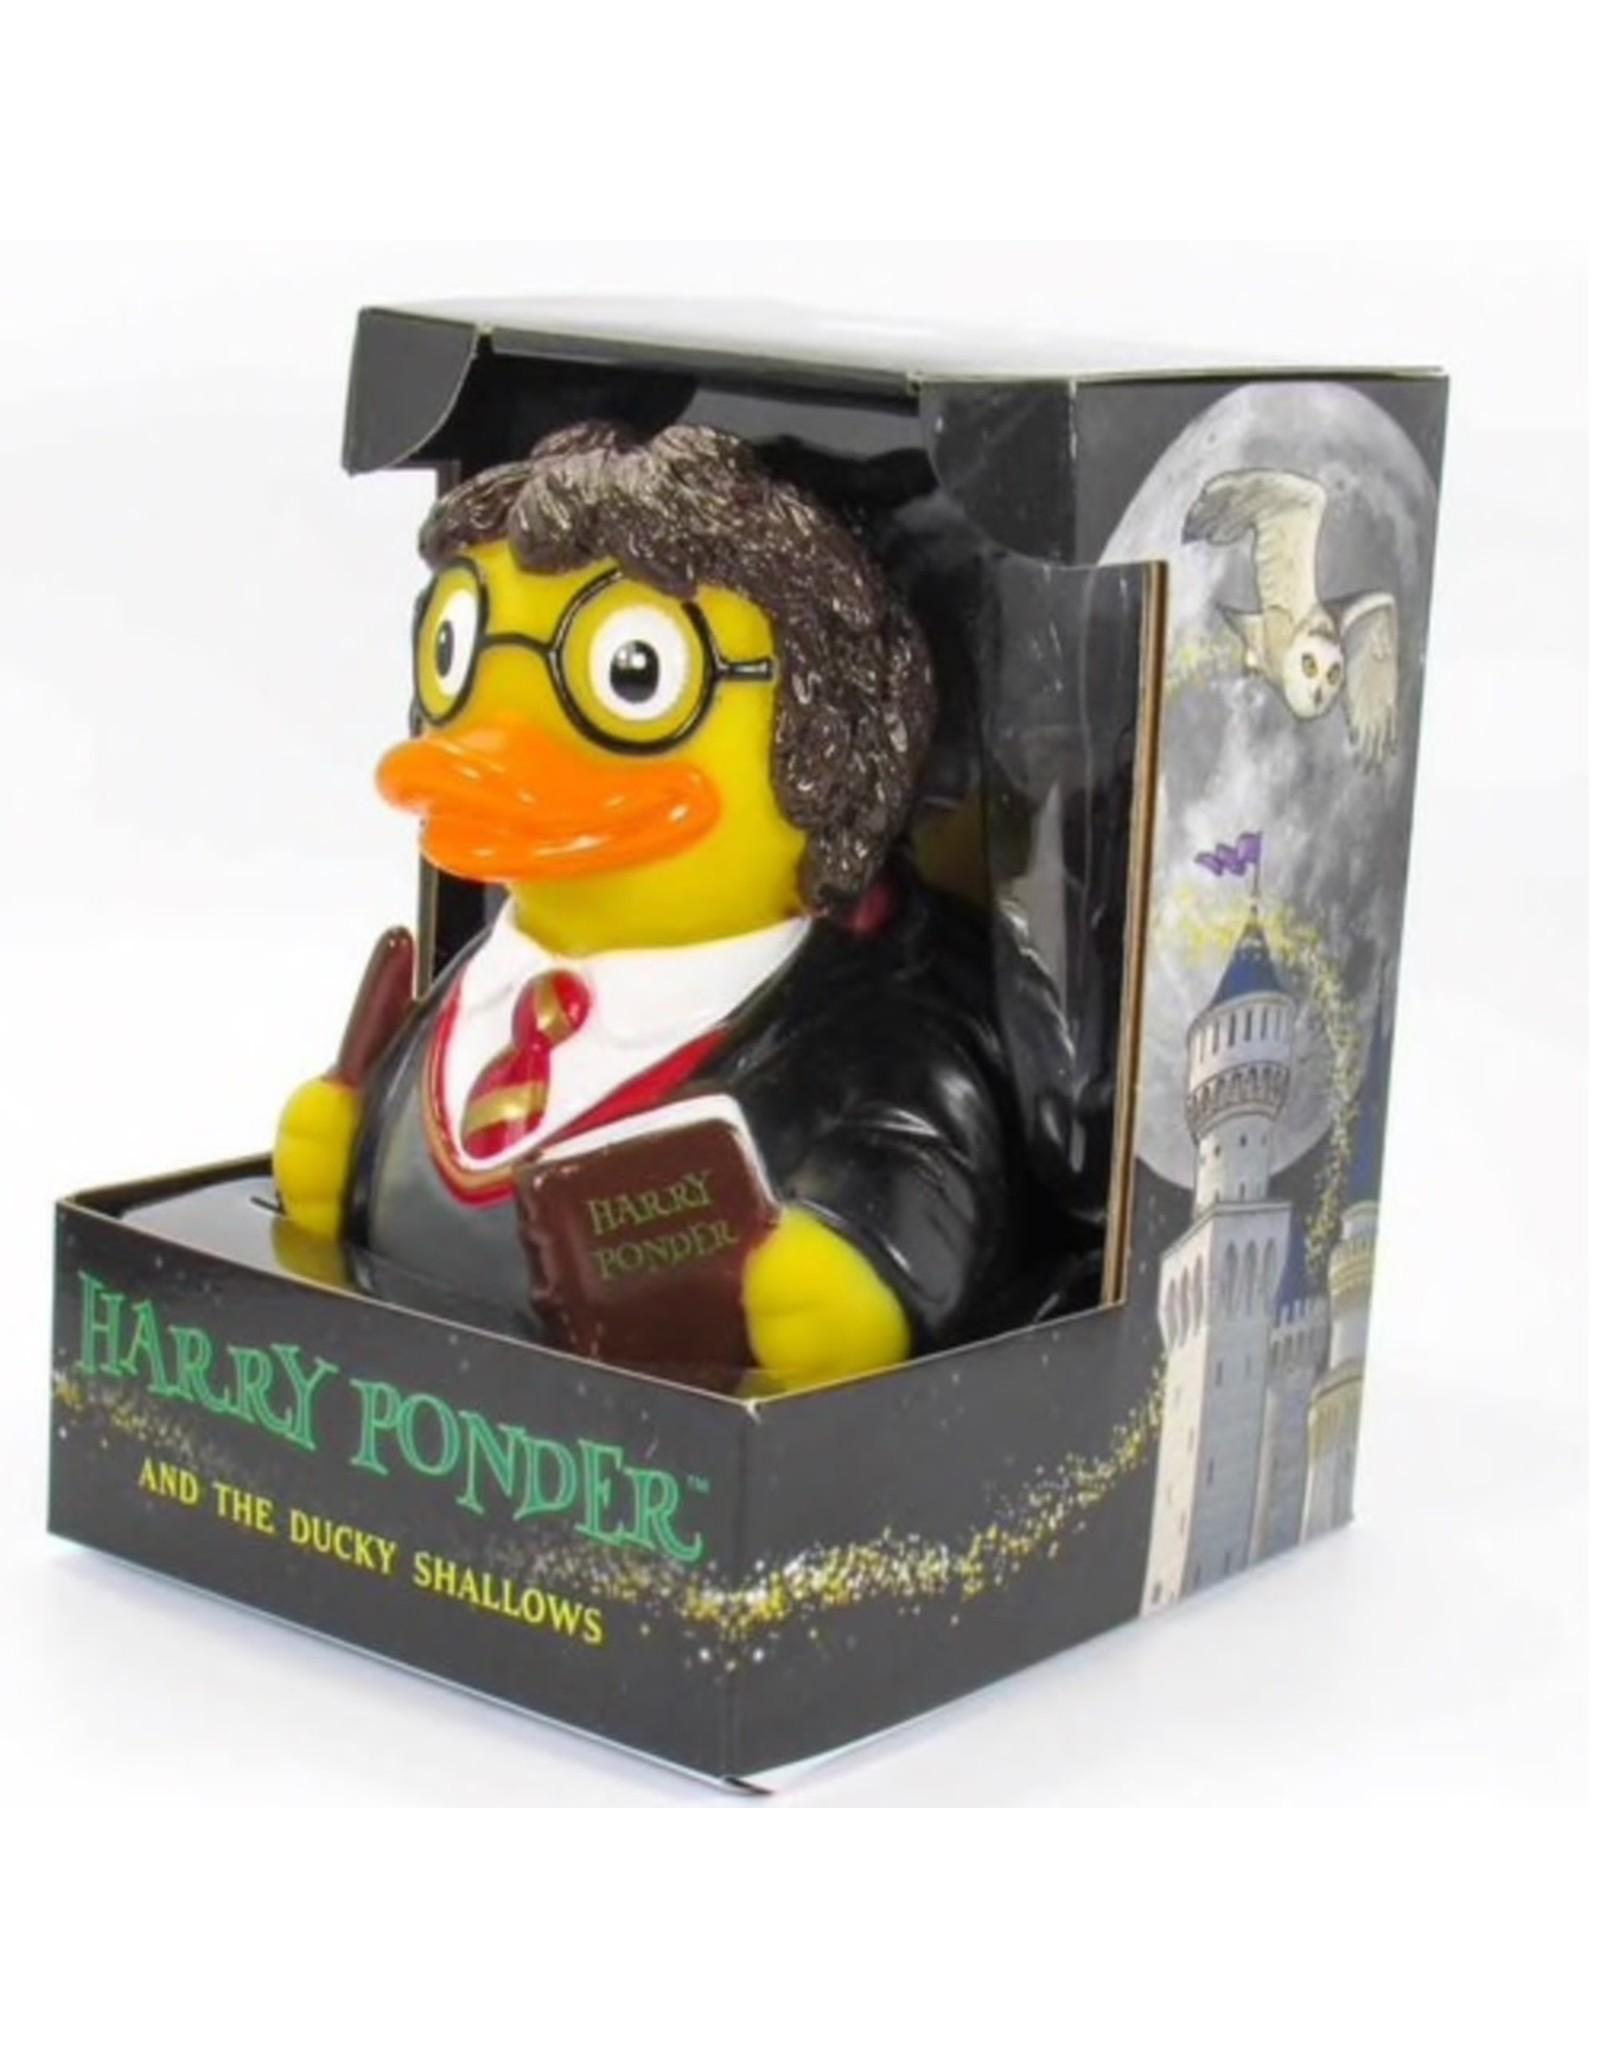 Harry Ponder